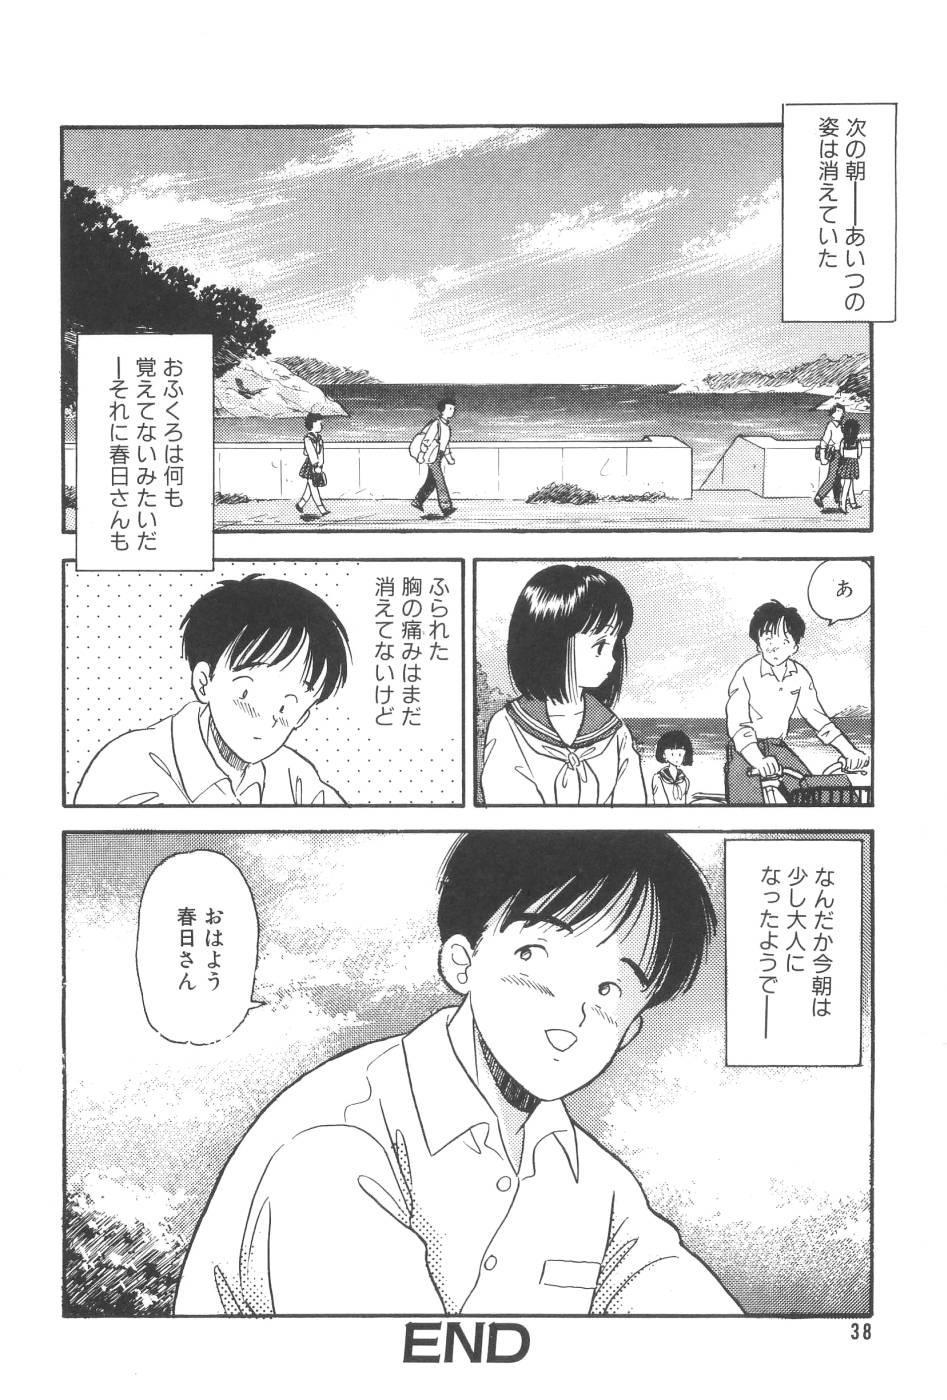 Namioto Densetsu 39